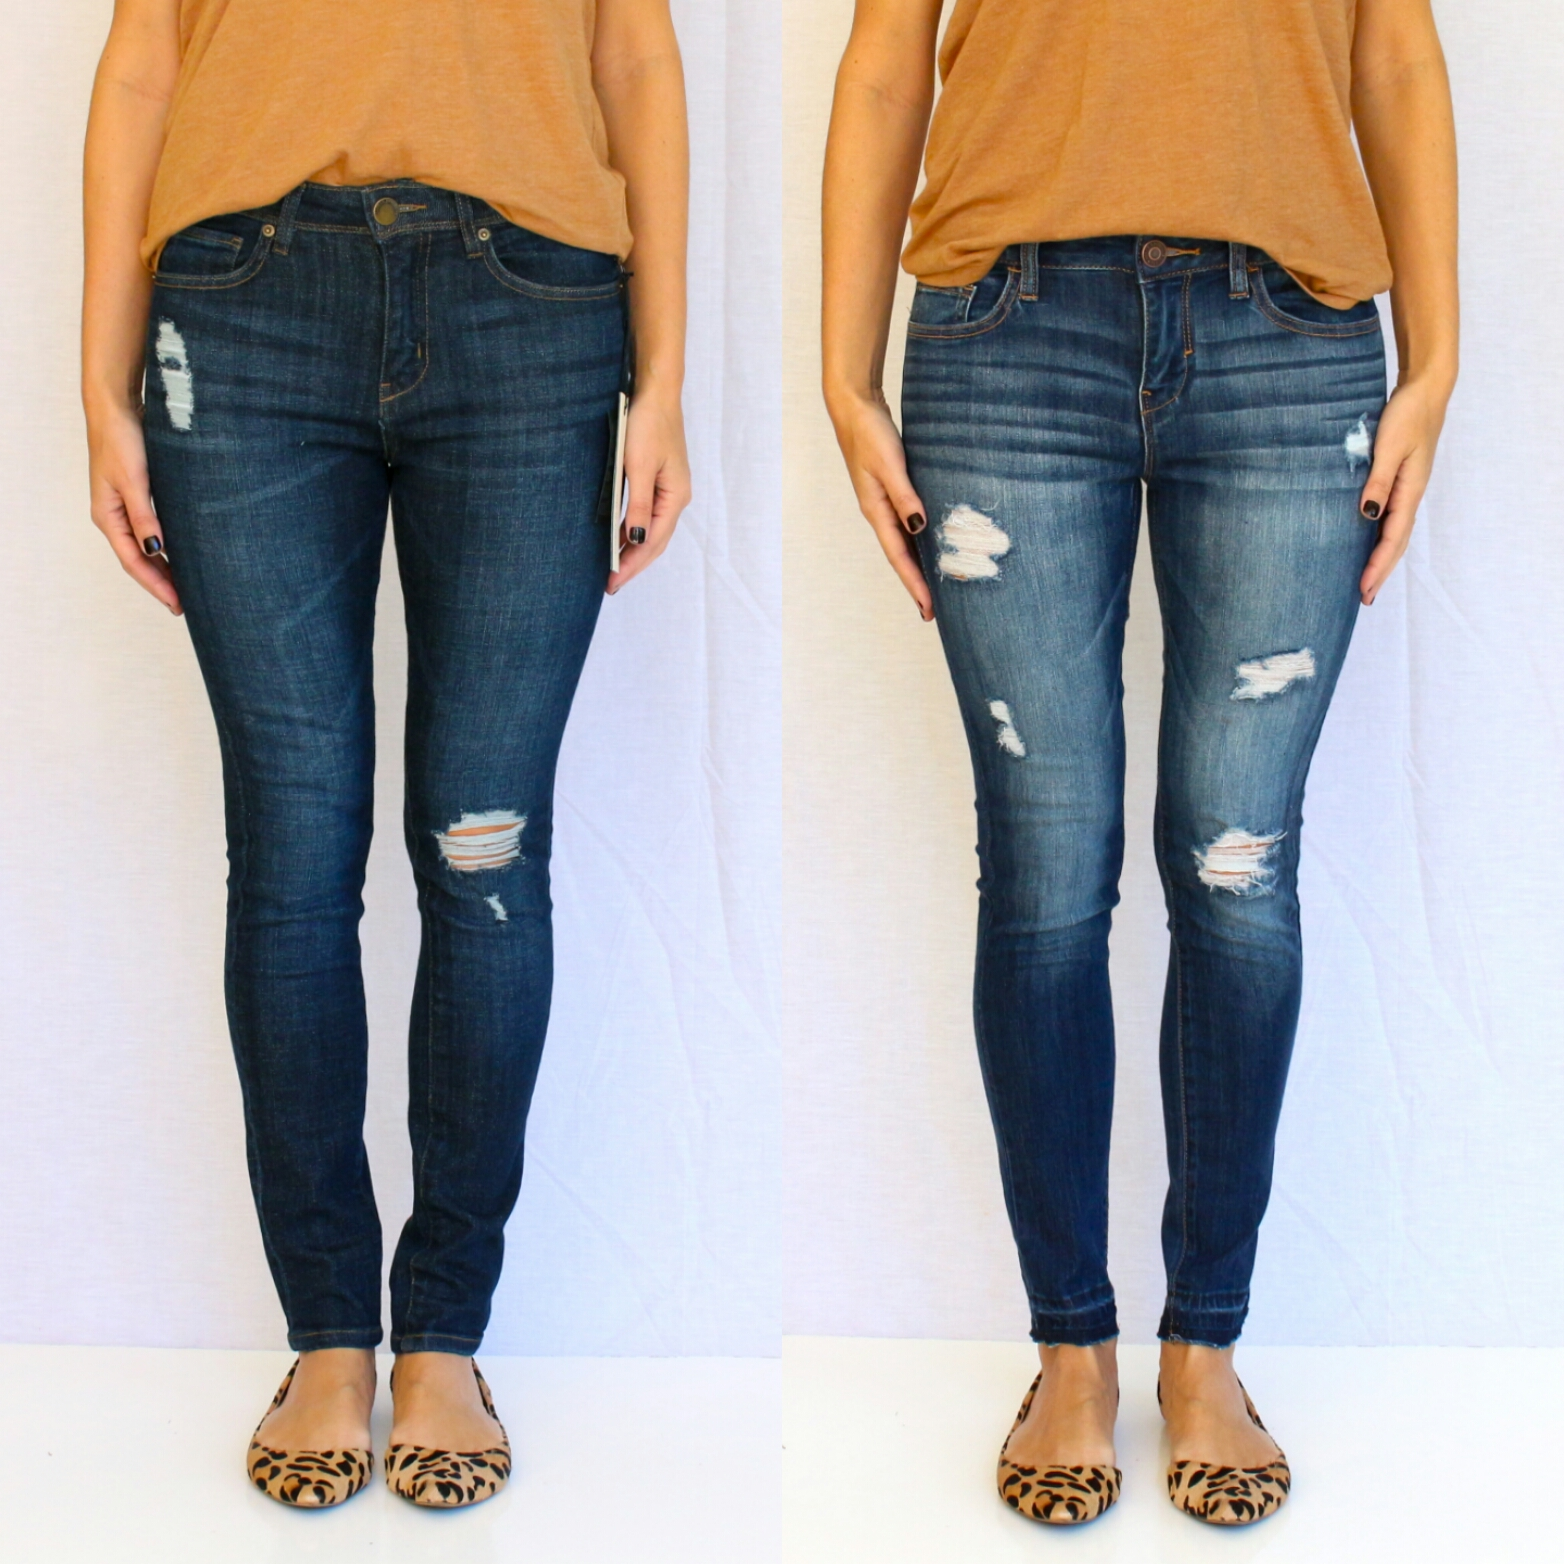 Jeans under $30